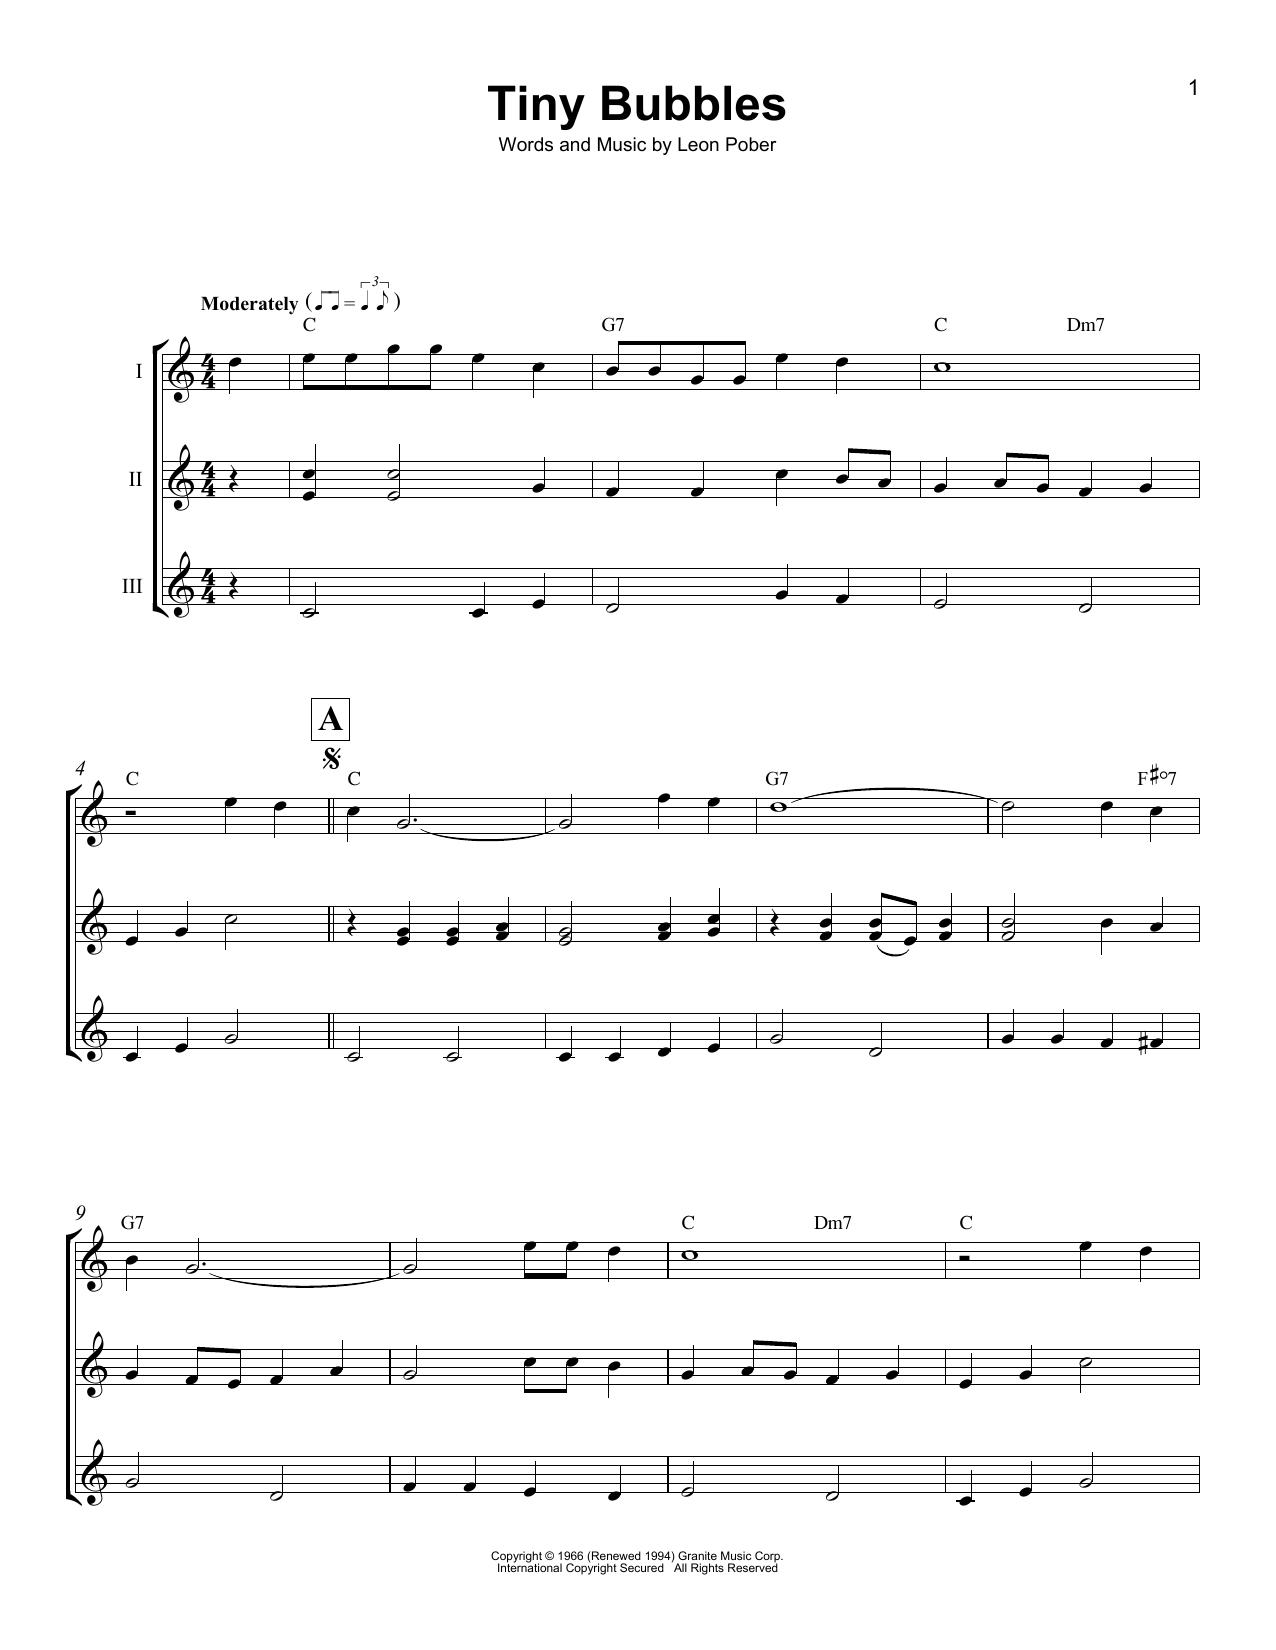 Tiny Bubbles Sheet Music